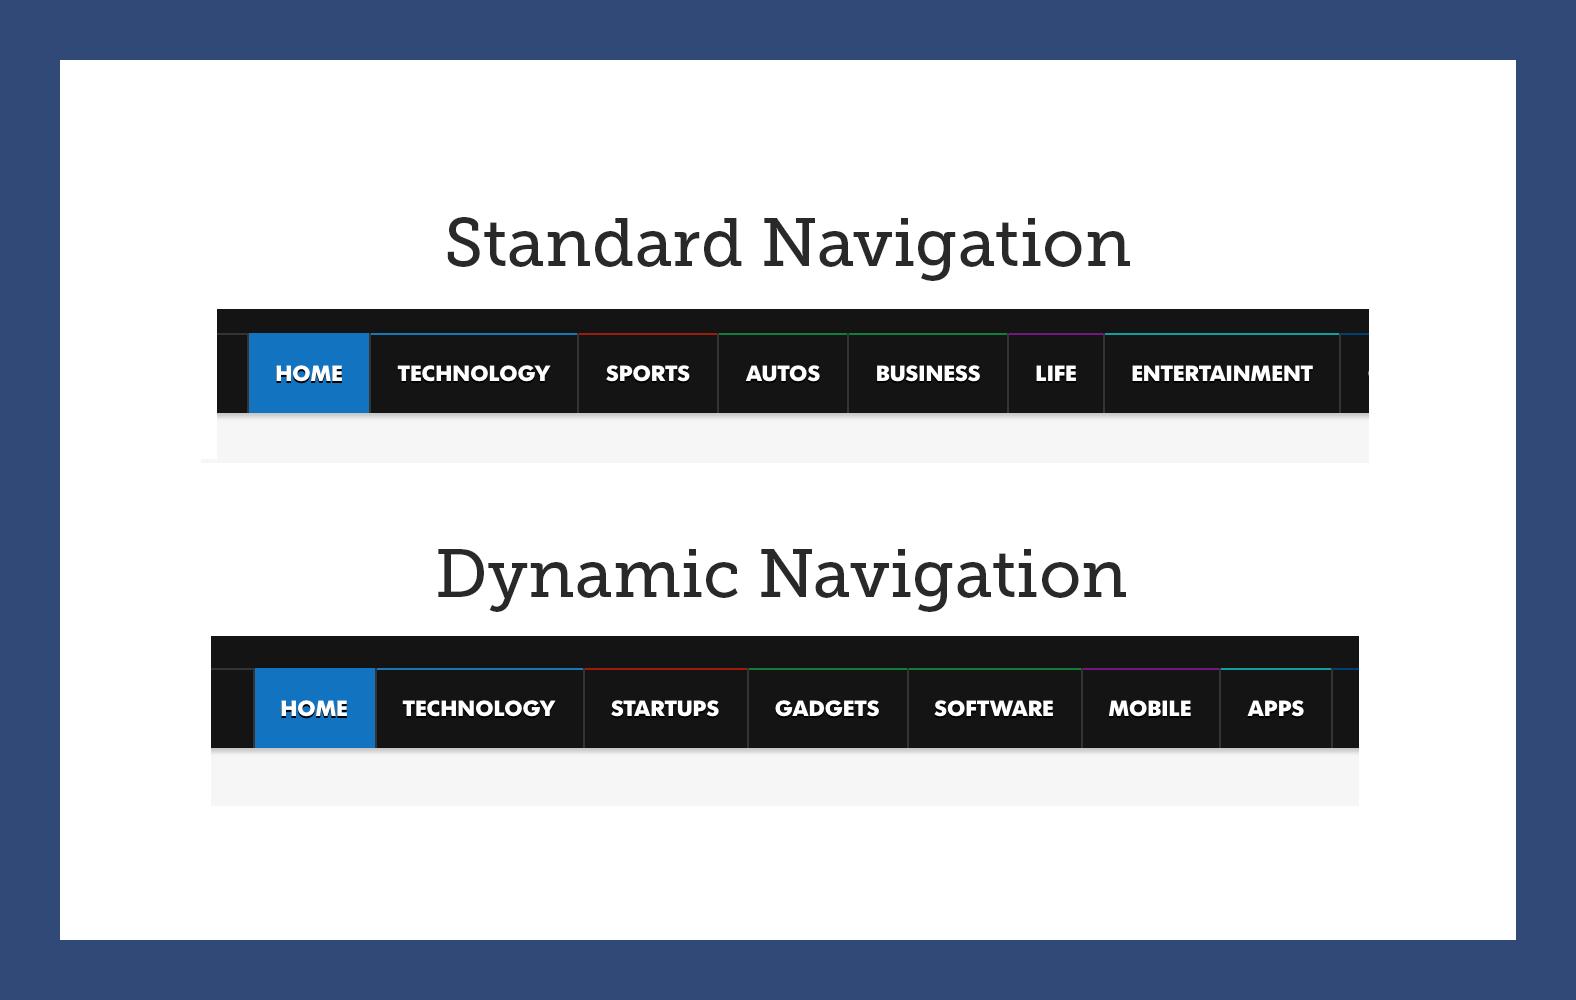 Dynamic Navigation